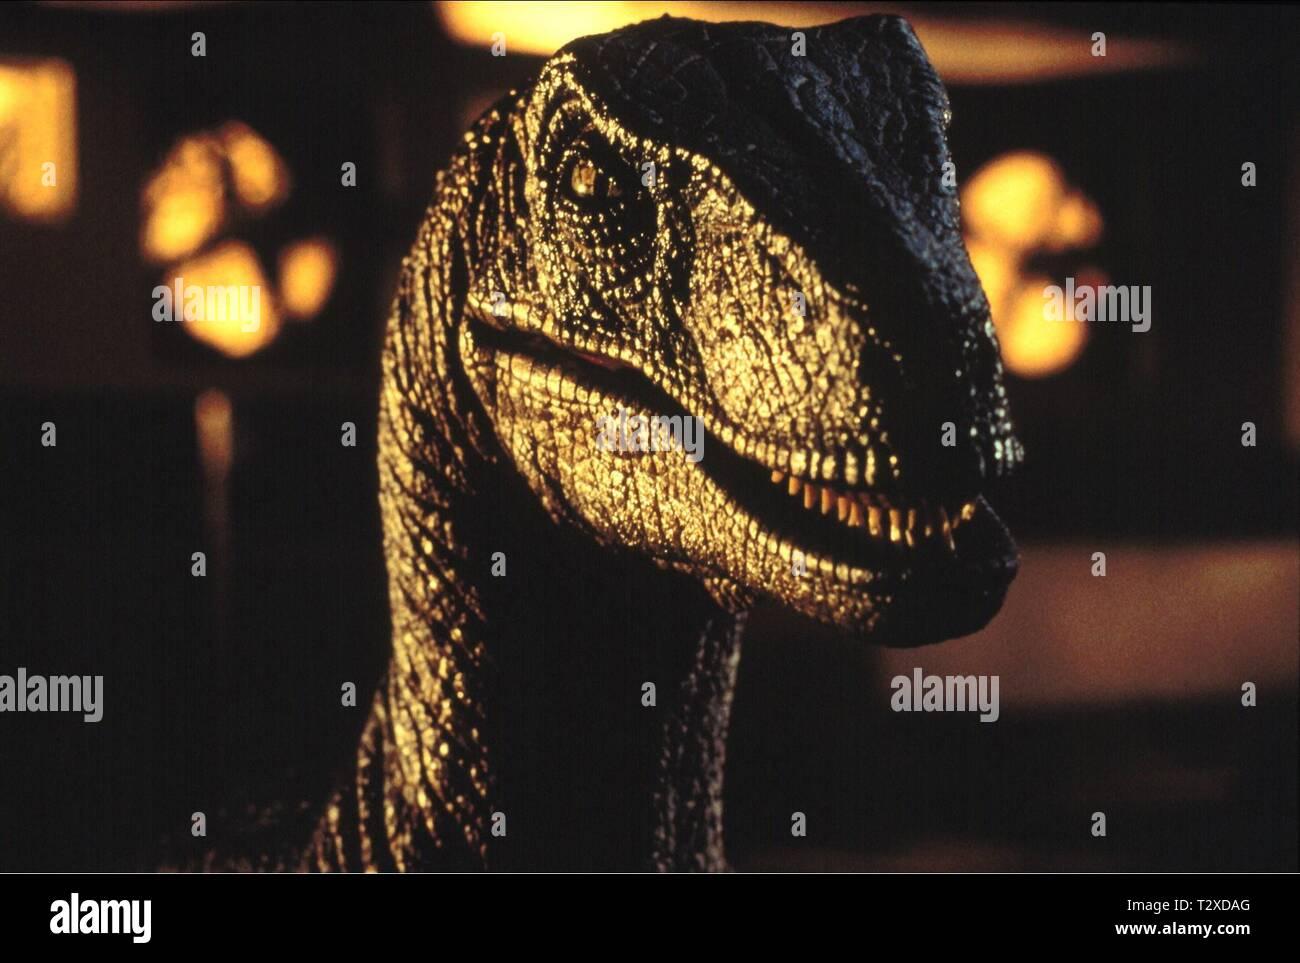 RAPTOR, JURASSIC PARK, 1993 - Stock Image